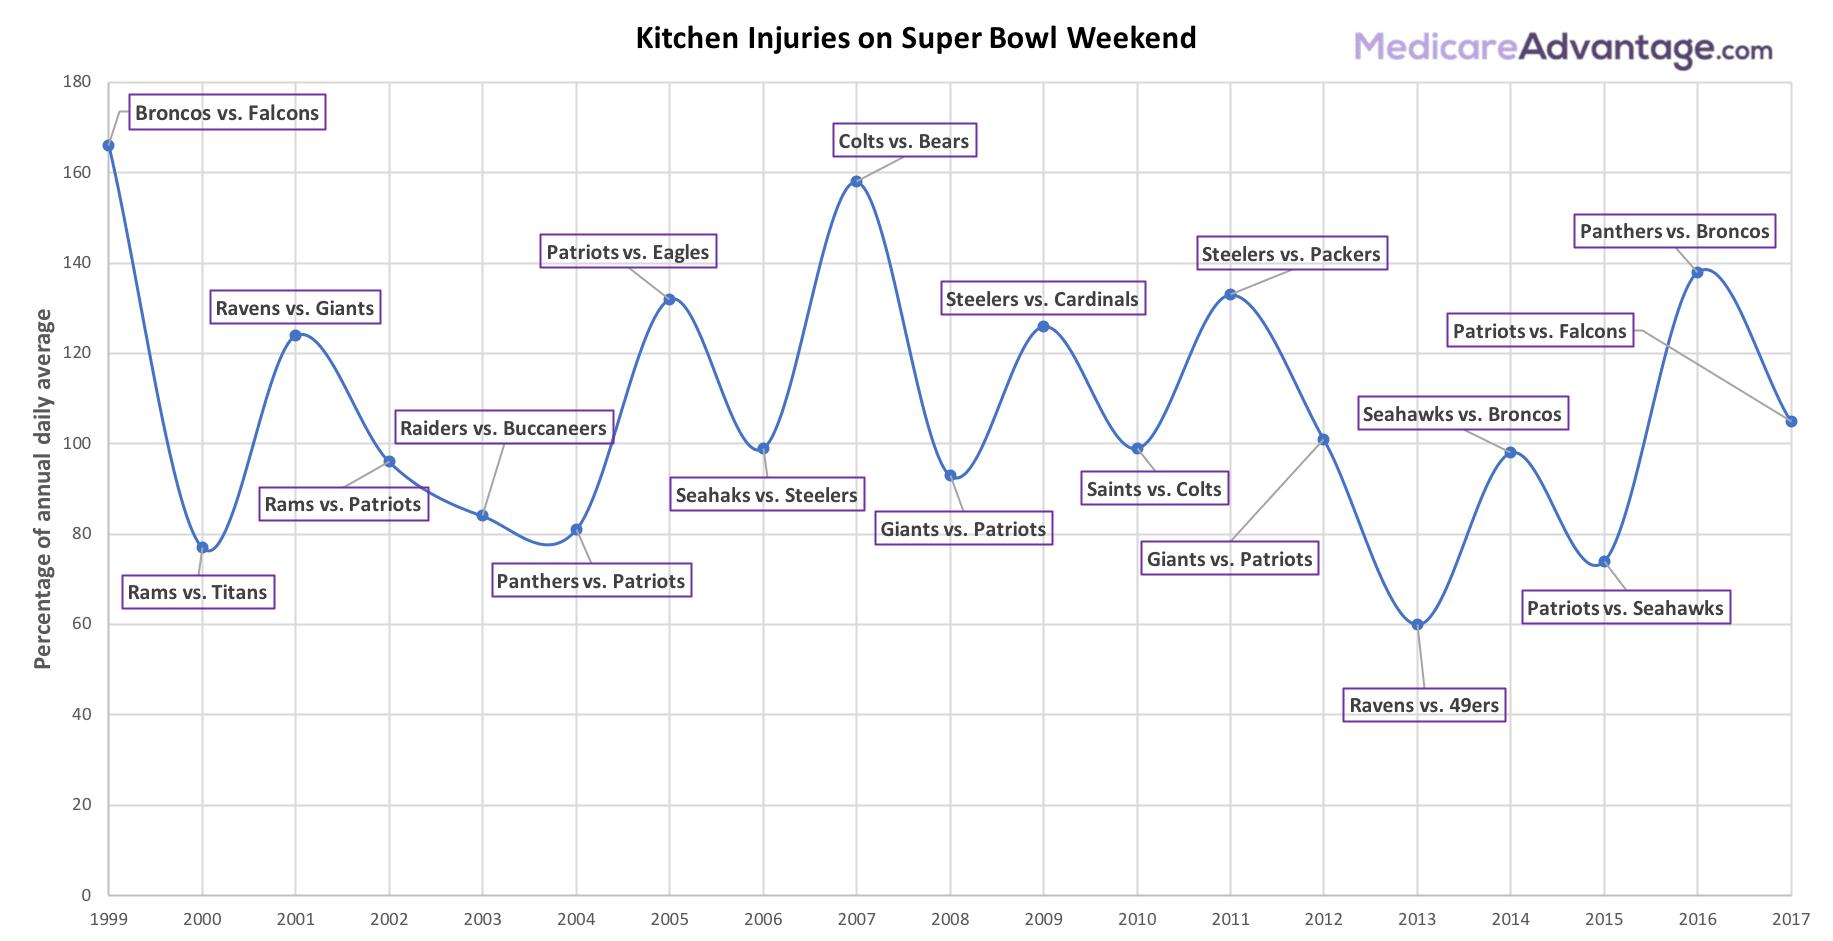 Super Bowl Kitchen Injuries Chart